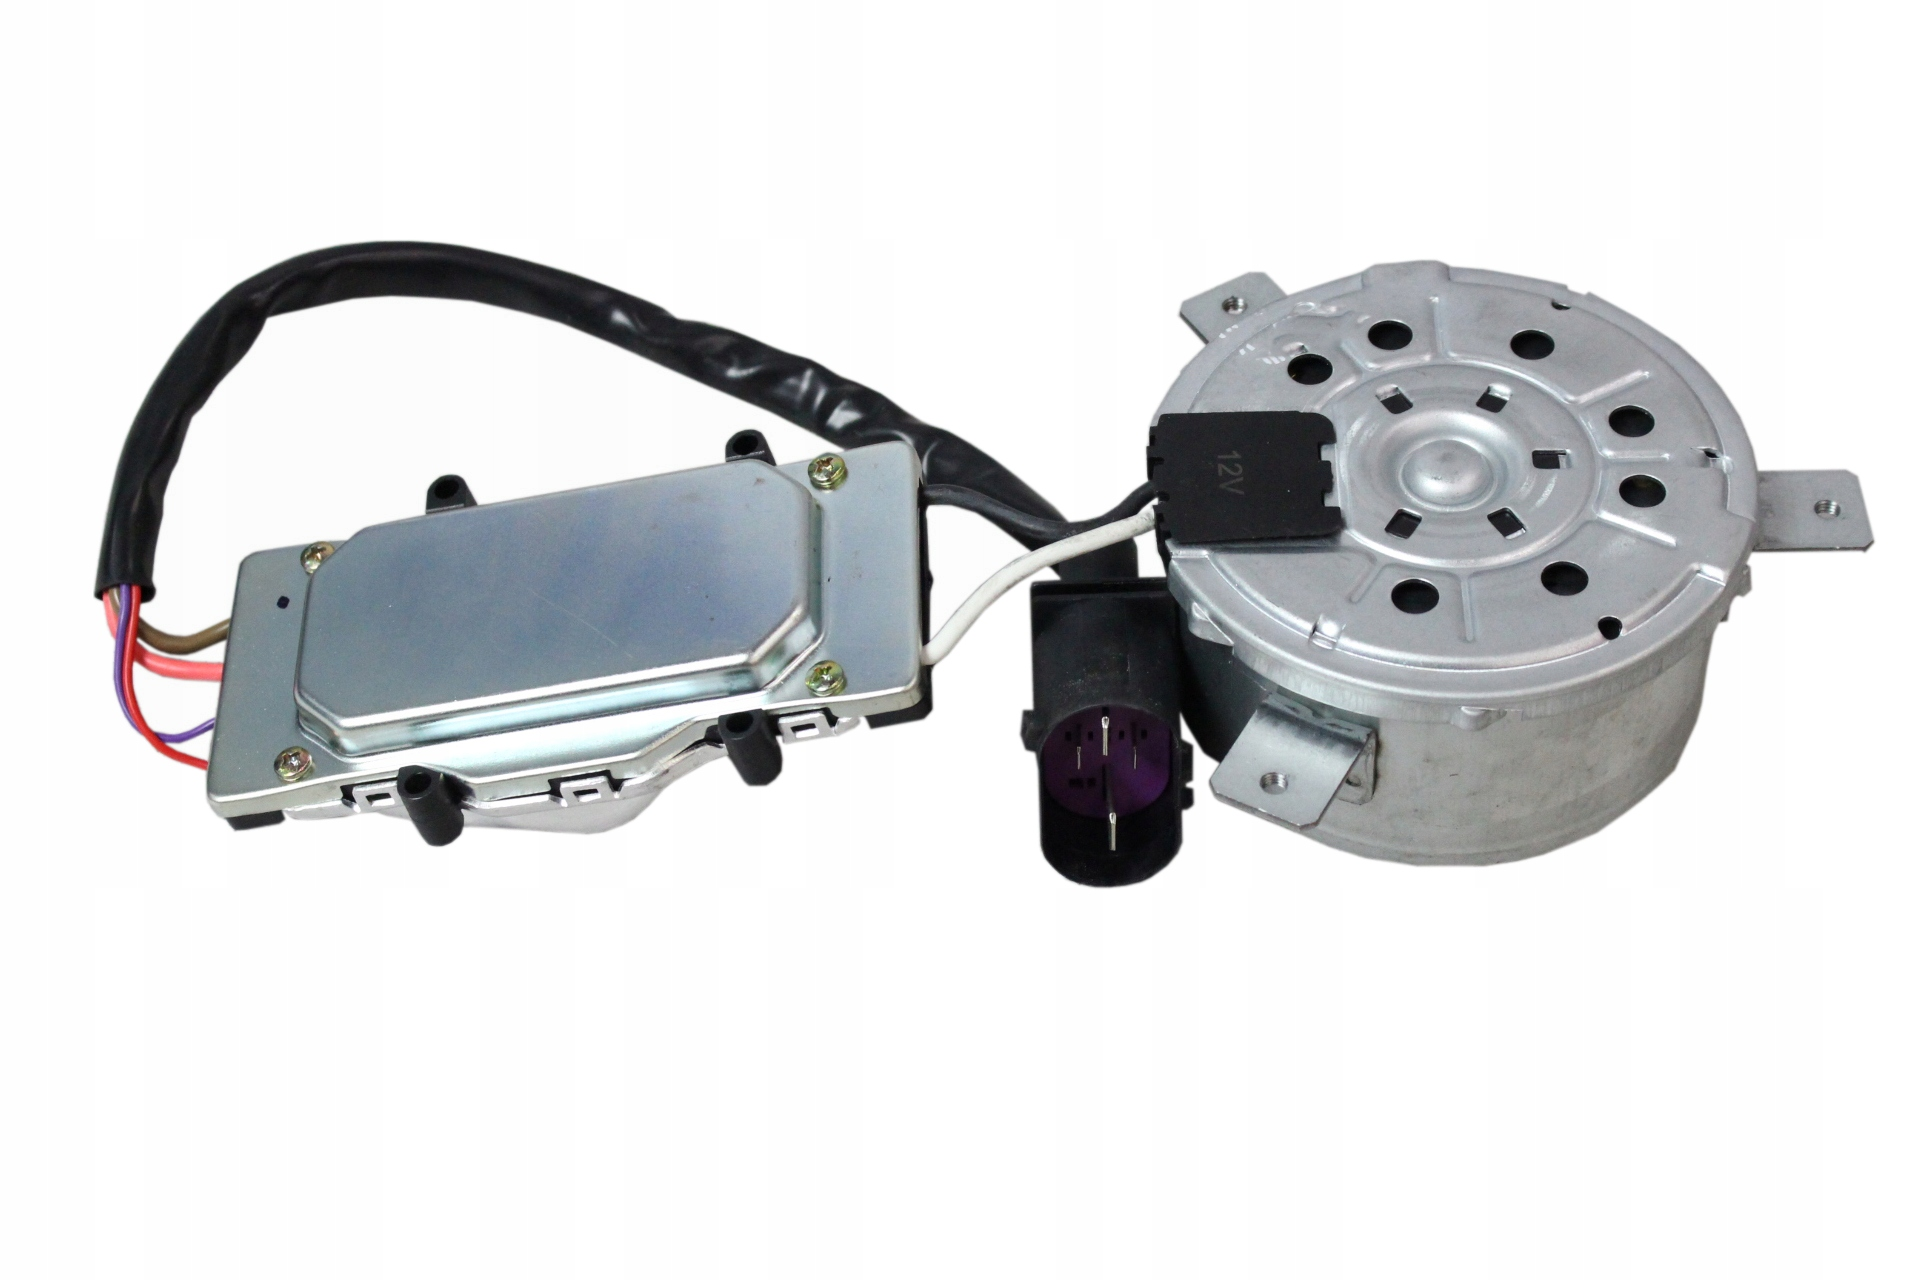 audi a6 c6 tdi модуль управляющий двигатель 4f0121003k